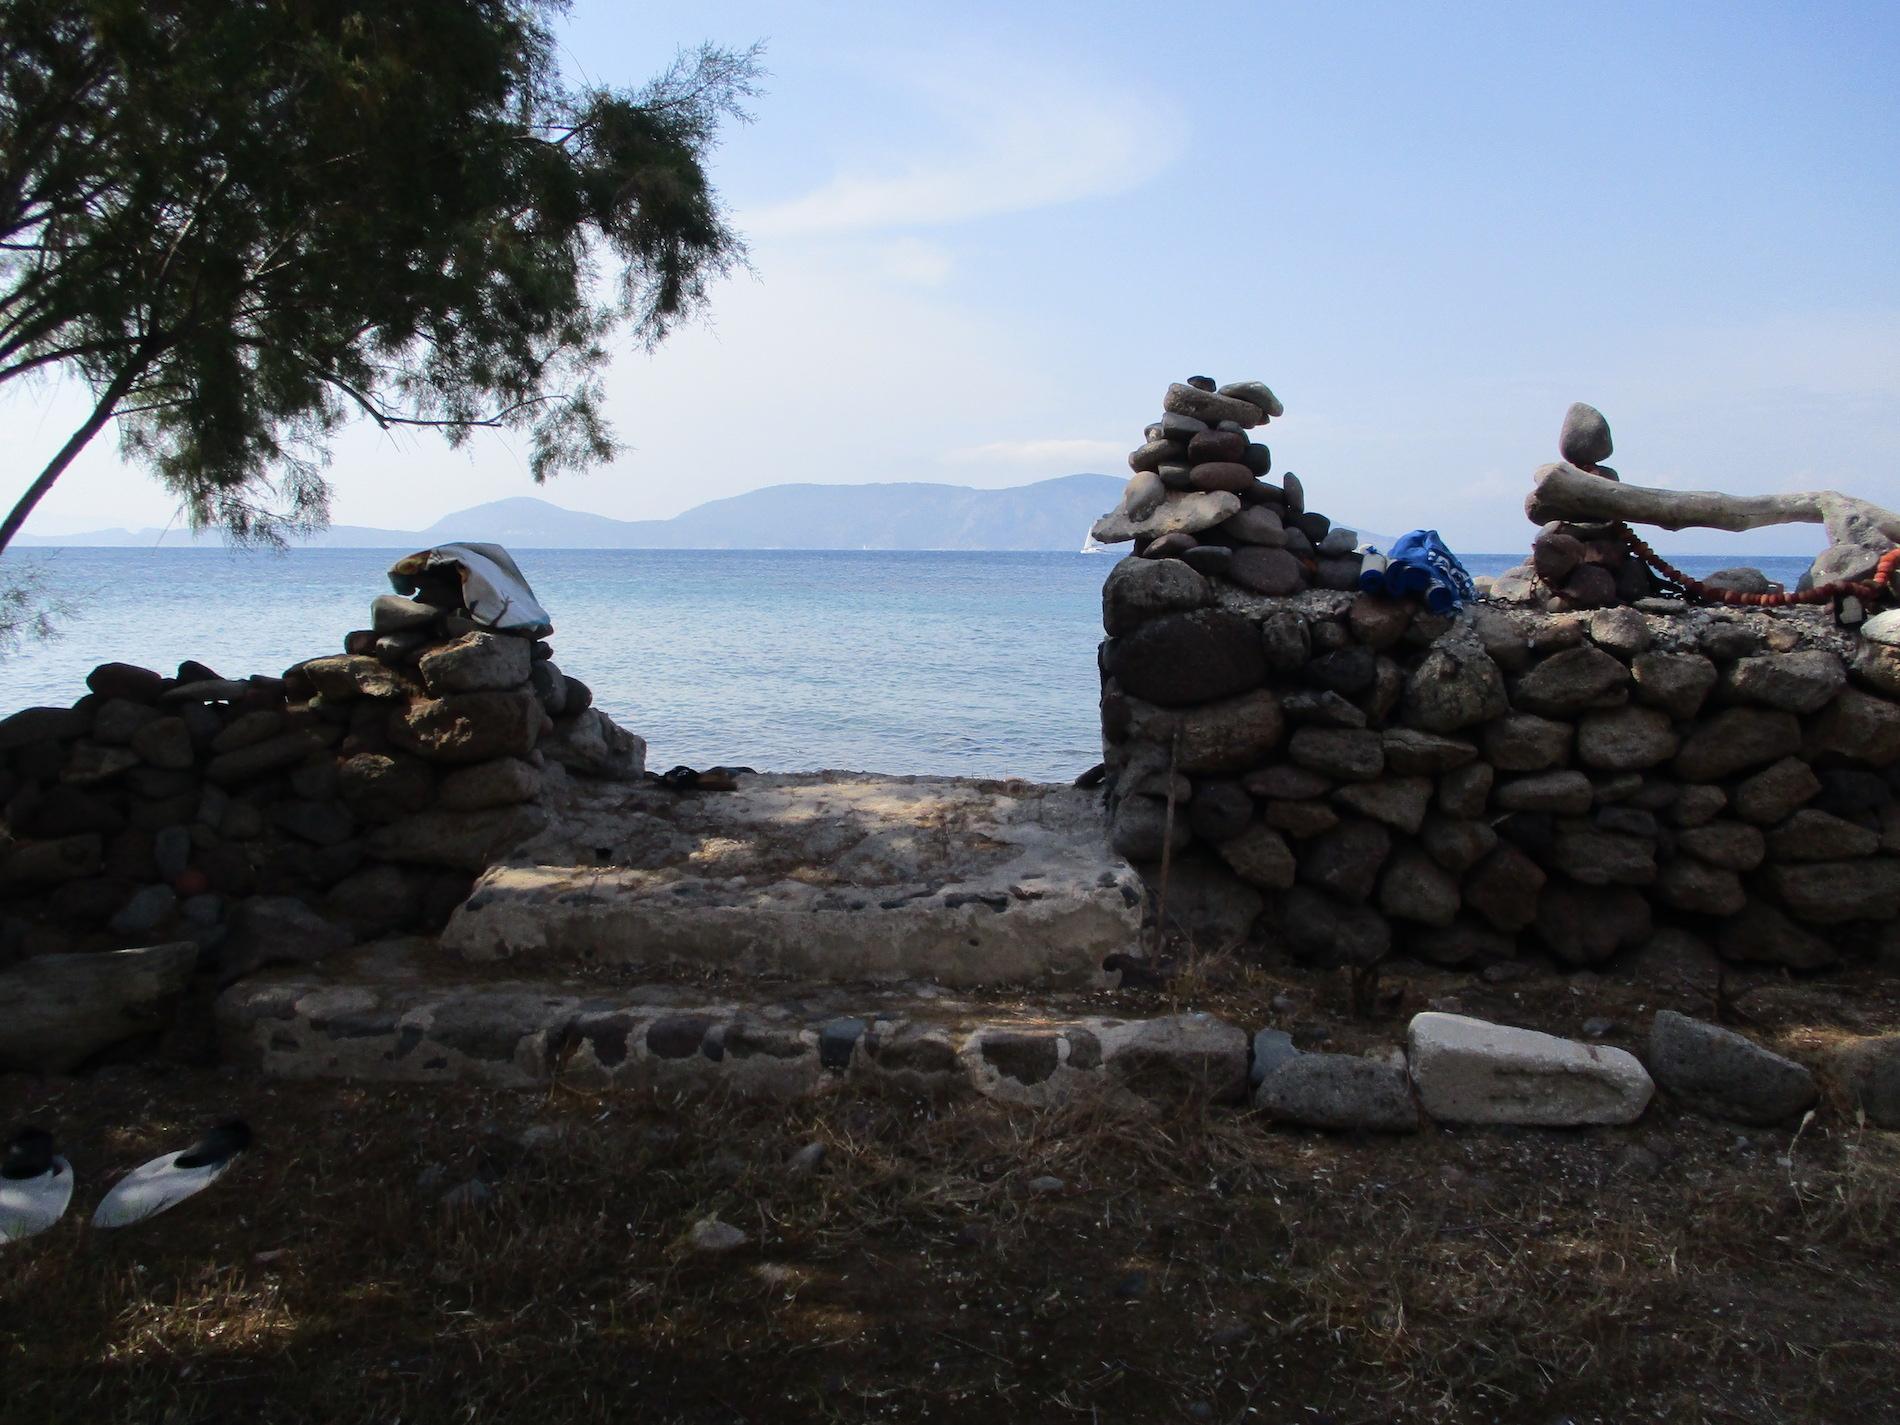 limnisa writing retreat, rock sculptures